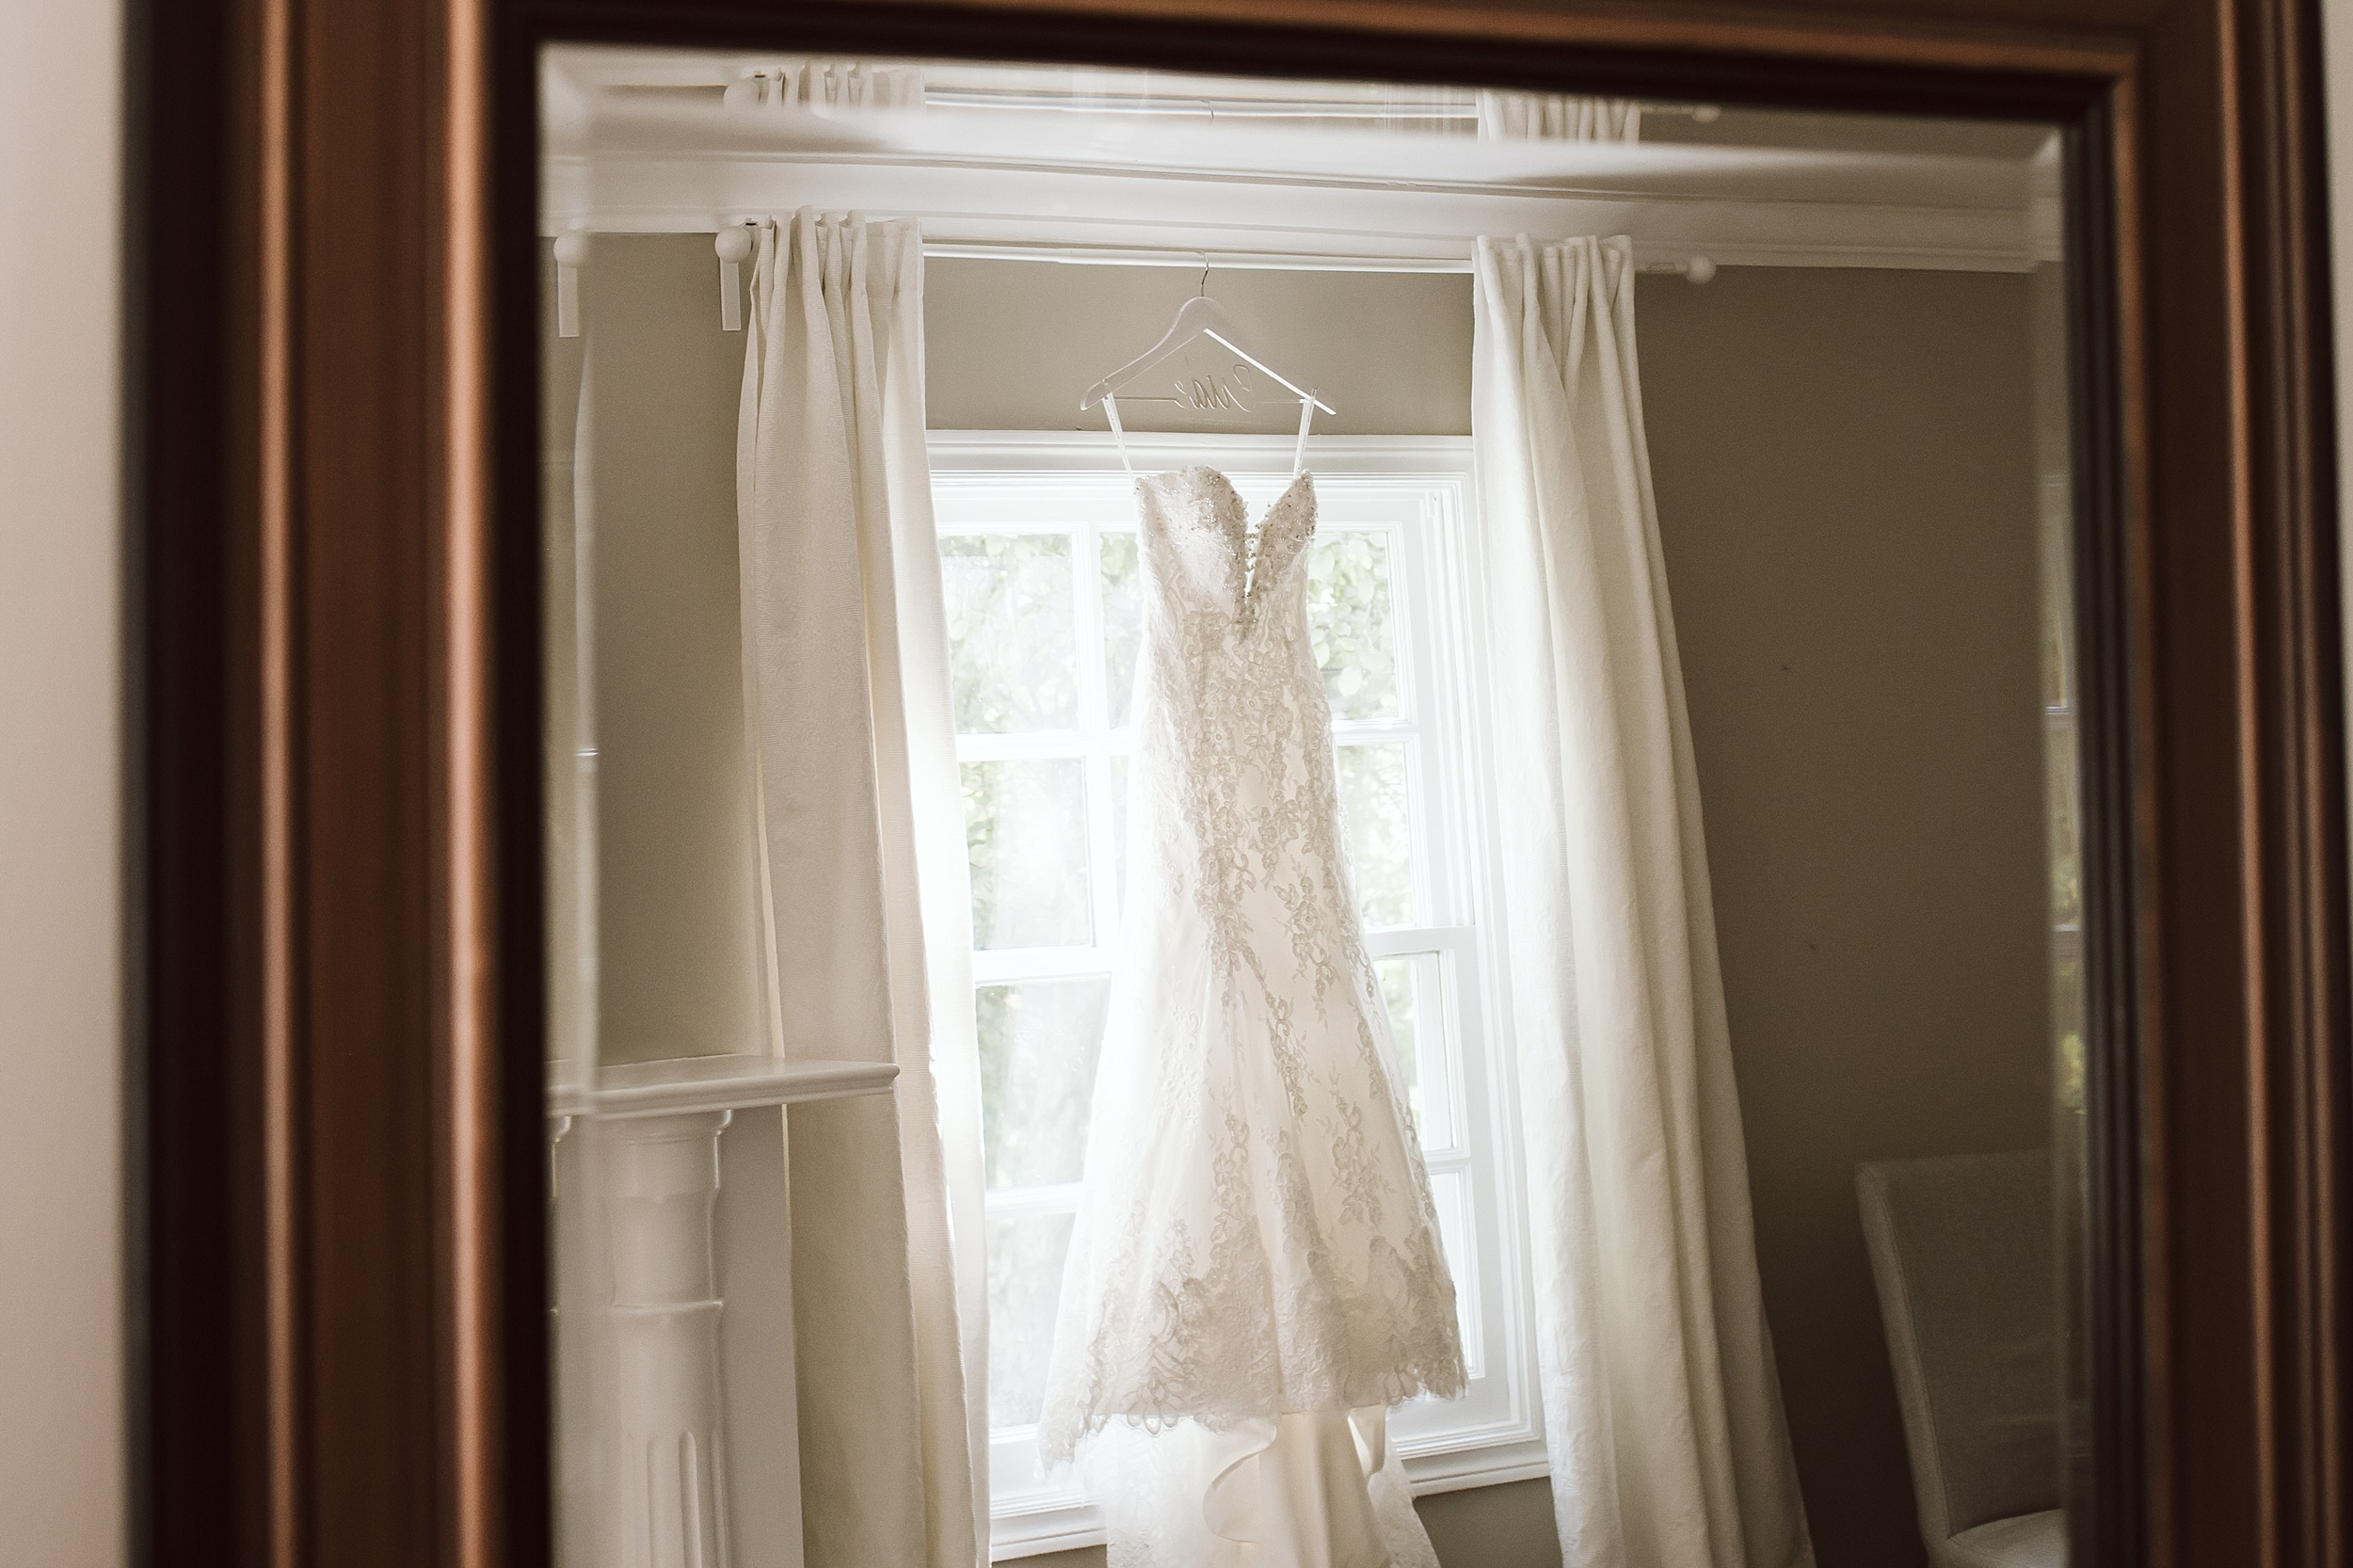 Doctors_House_Kleinburg_Wedding_Toronto_Photographer_0004.jpg